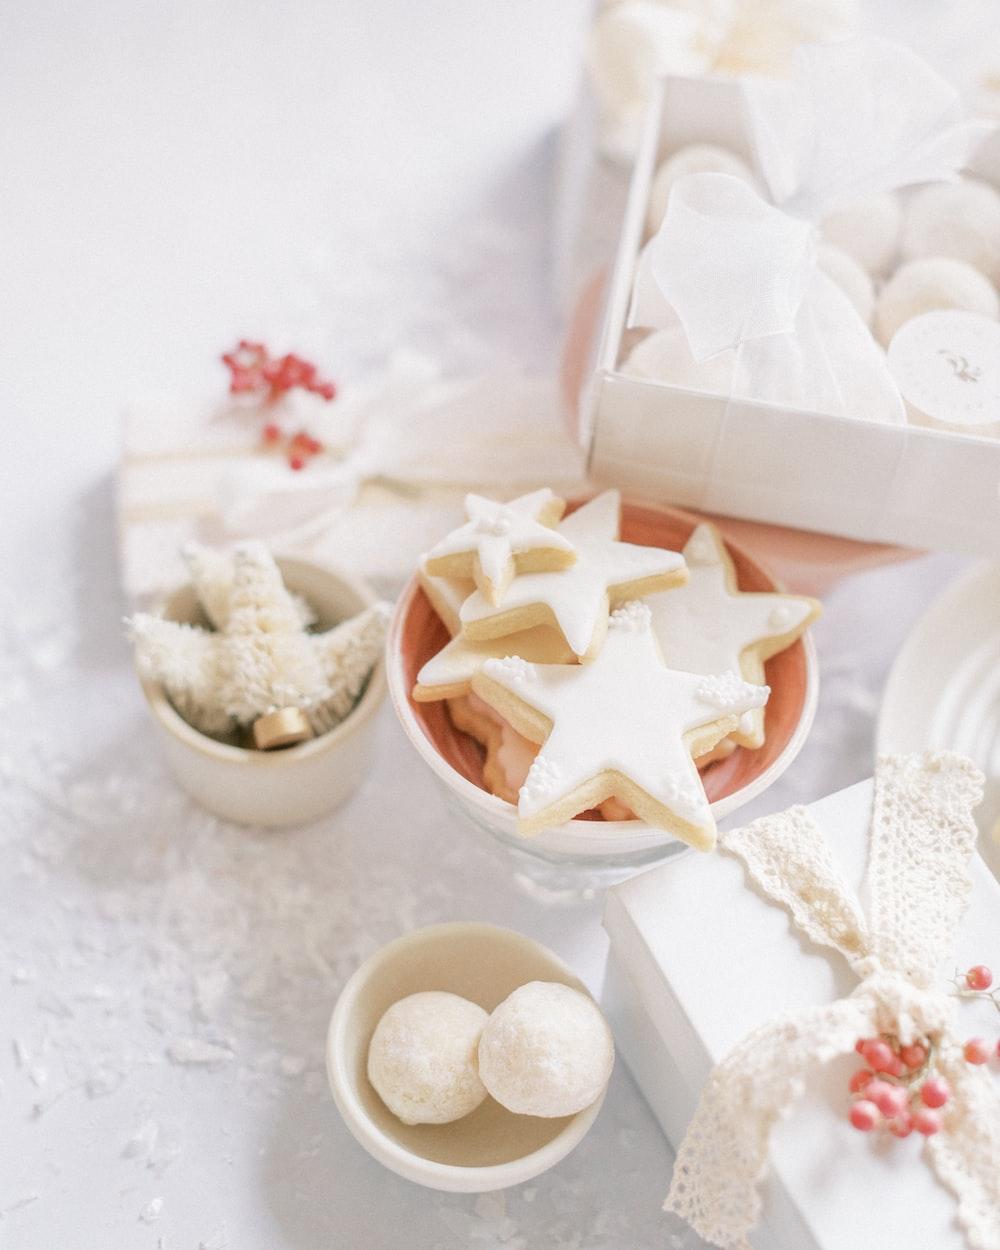 white ceramic bowl on white table